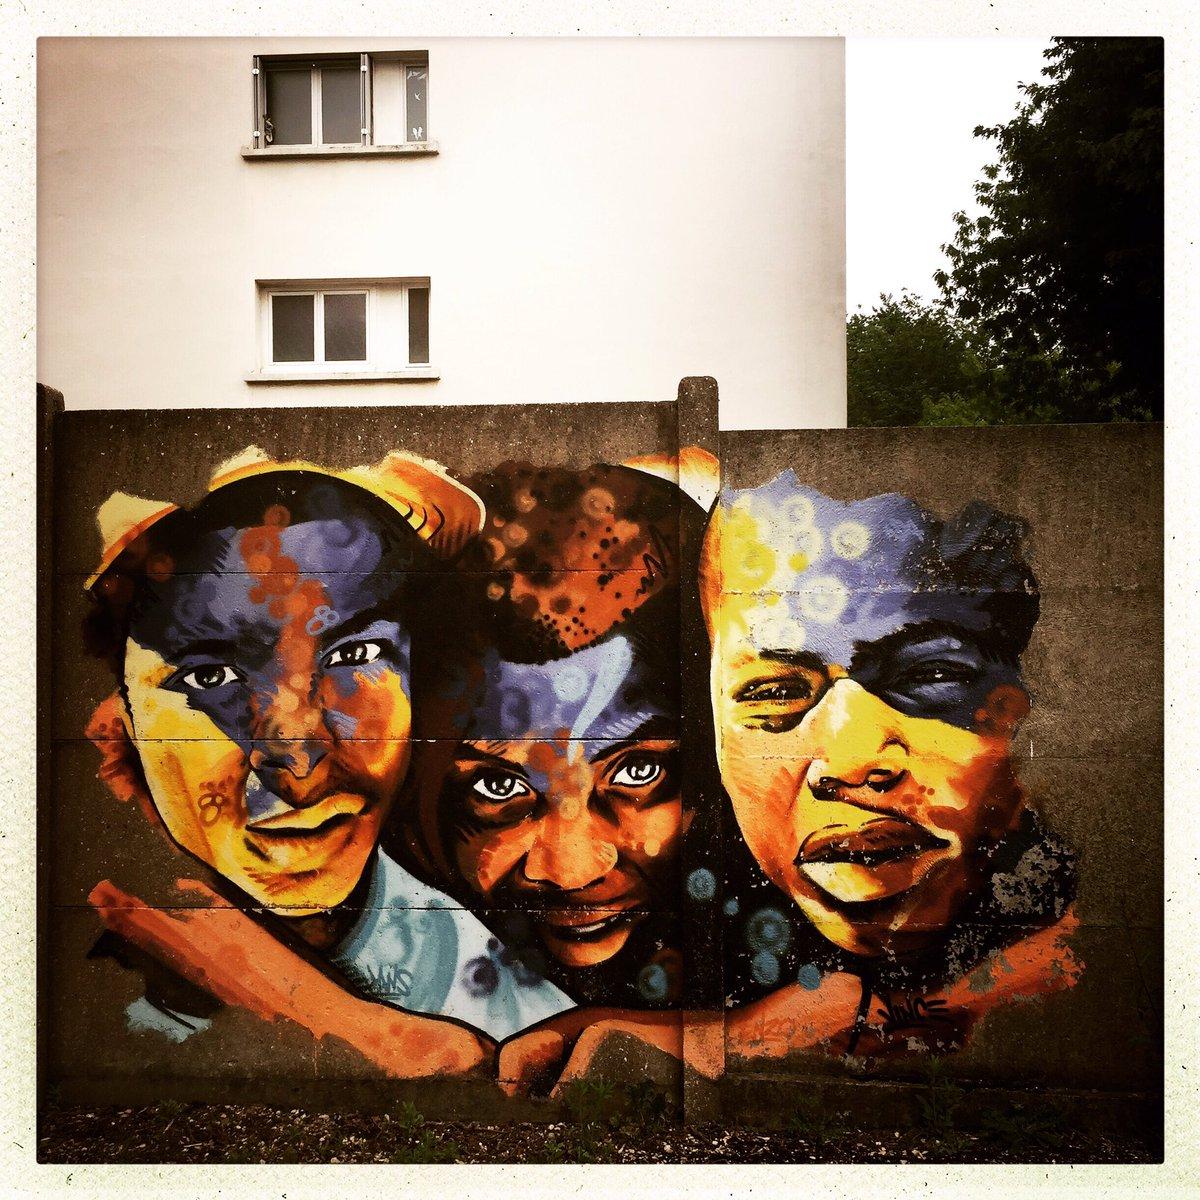 RT @102bis: Au fil des pas : #grandparis. Rosny-sous-Bois. #streetphoto #streetphotography #StreetArt https://t.co/YvxsMBguAW